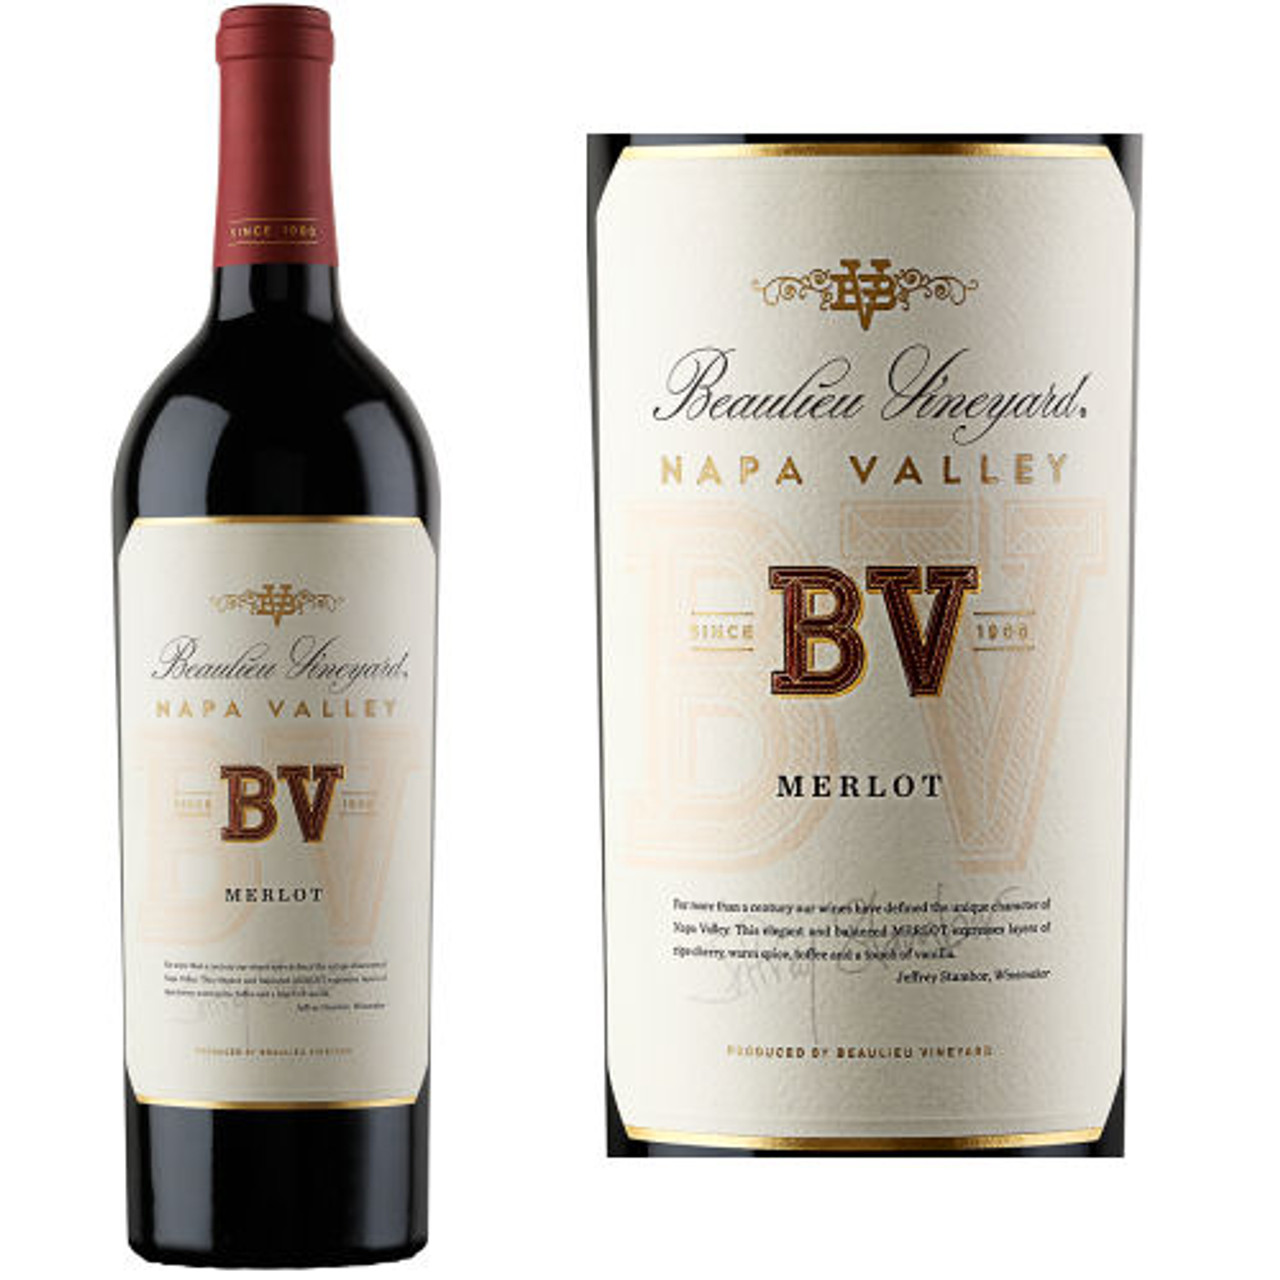 Beaulieu Vineyards Napa Merlot